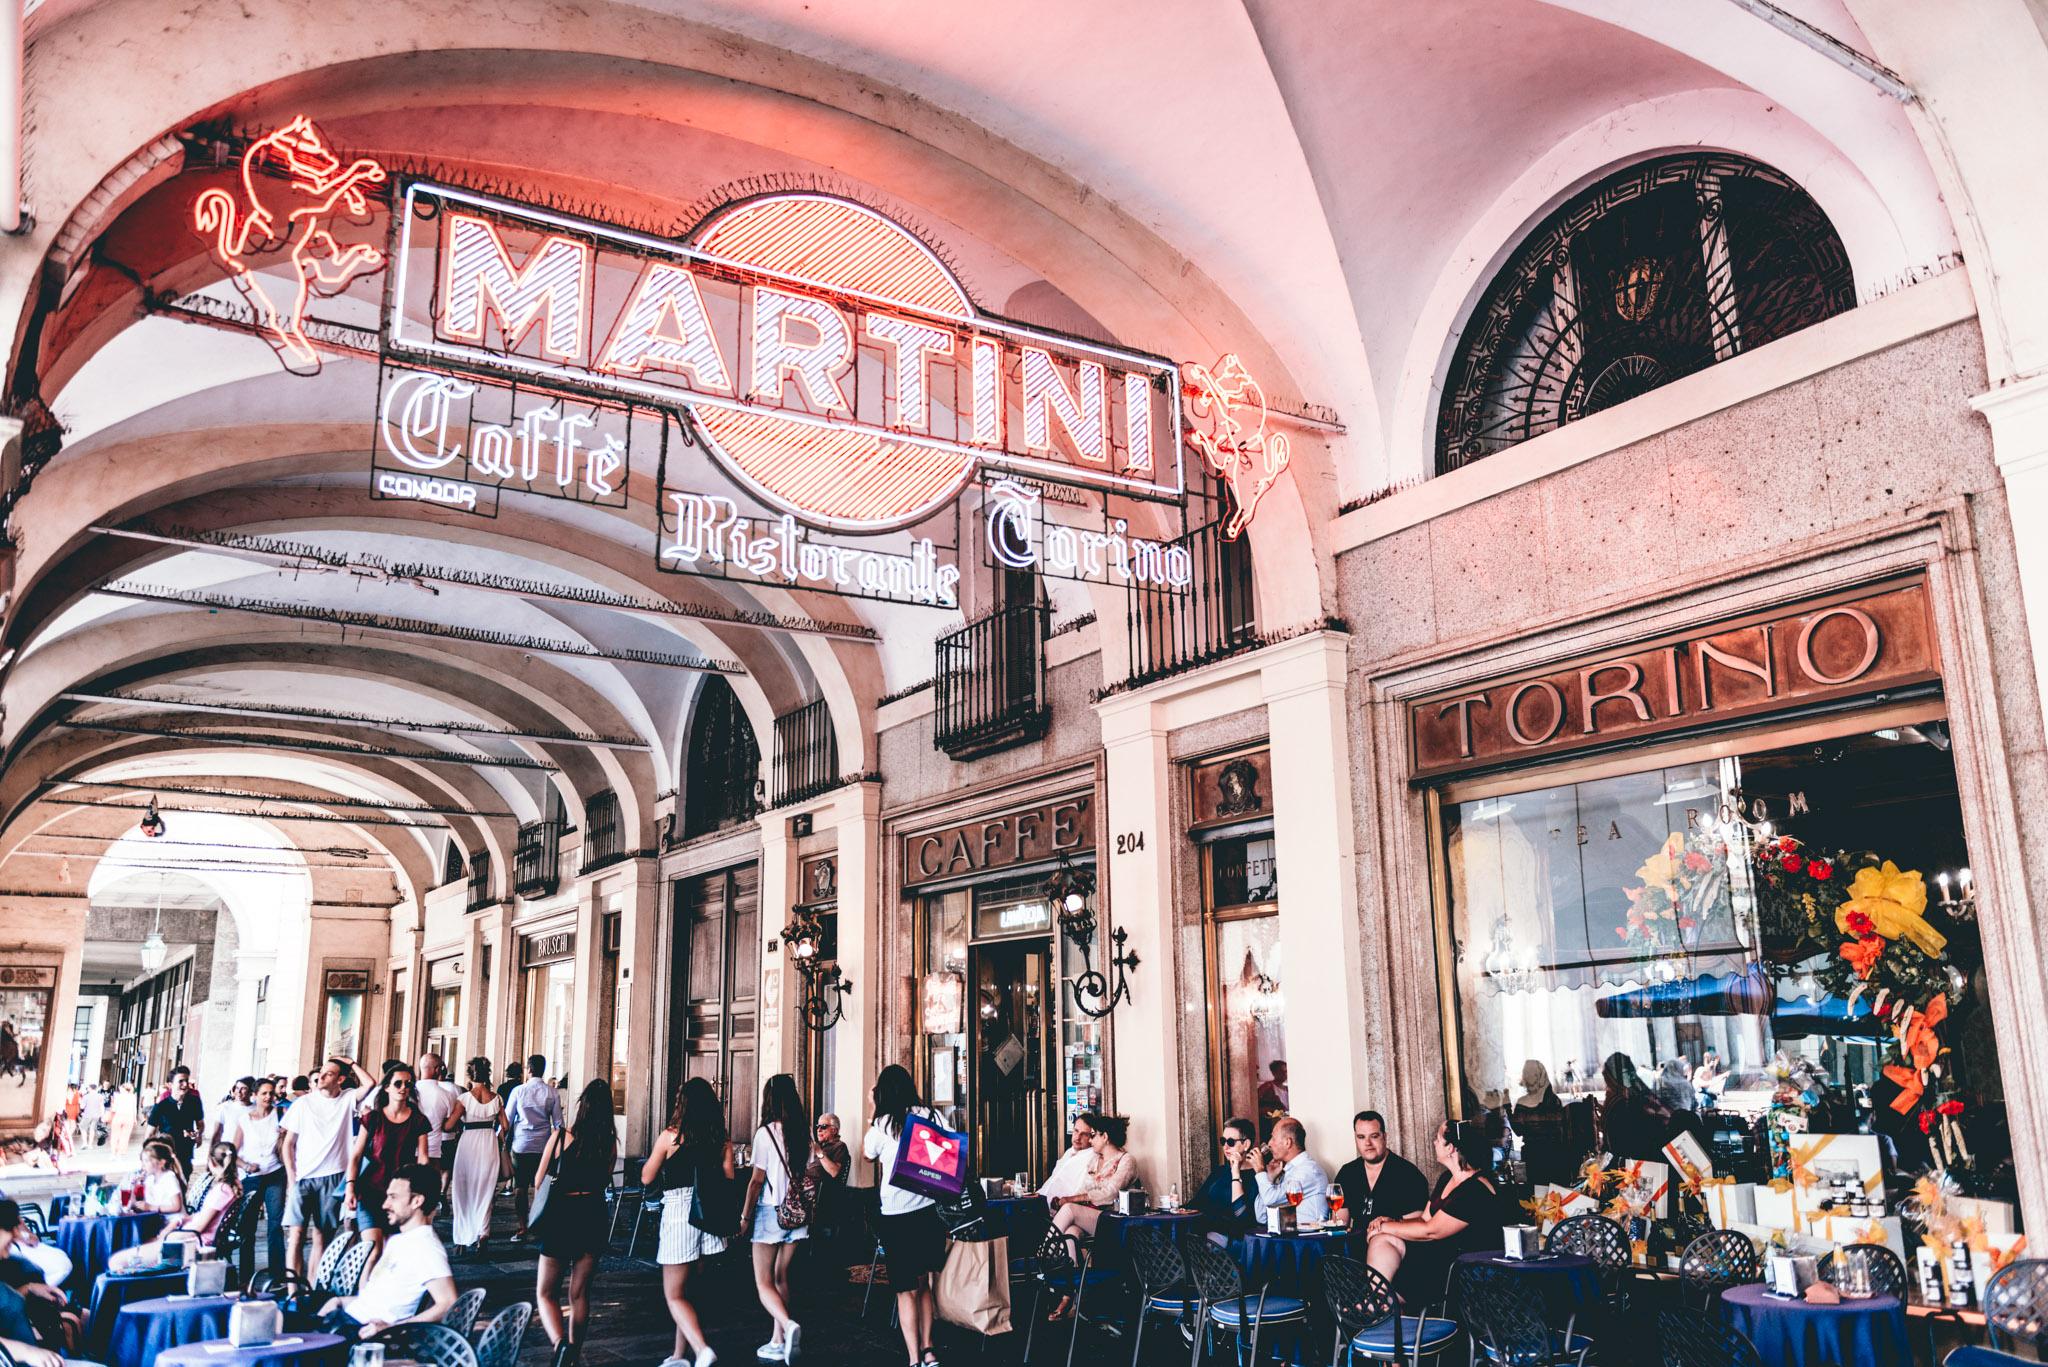 Italy : Turin : Caffe Torino, circa 1908